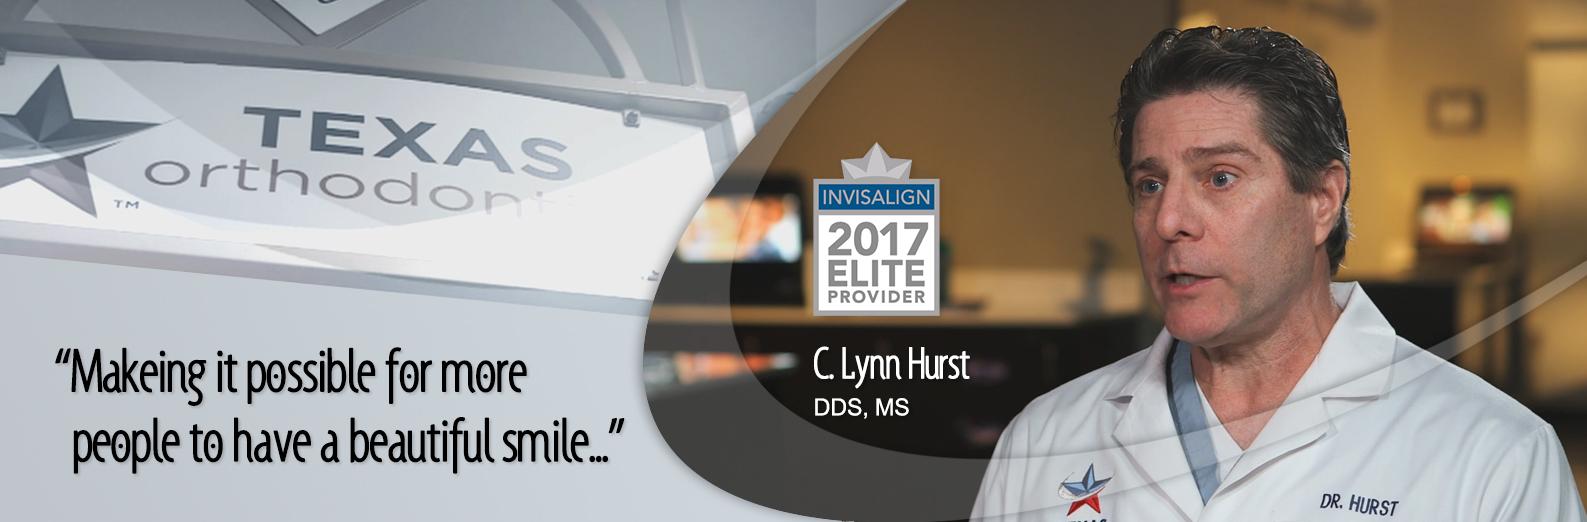 Lynn Hurst, DDS, MS Invisalign Elite Provider 2017